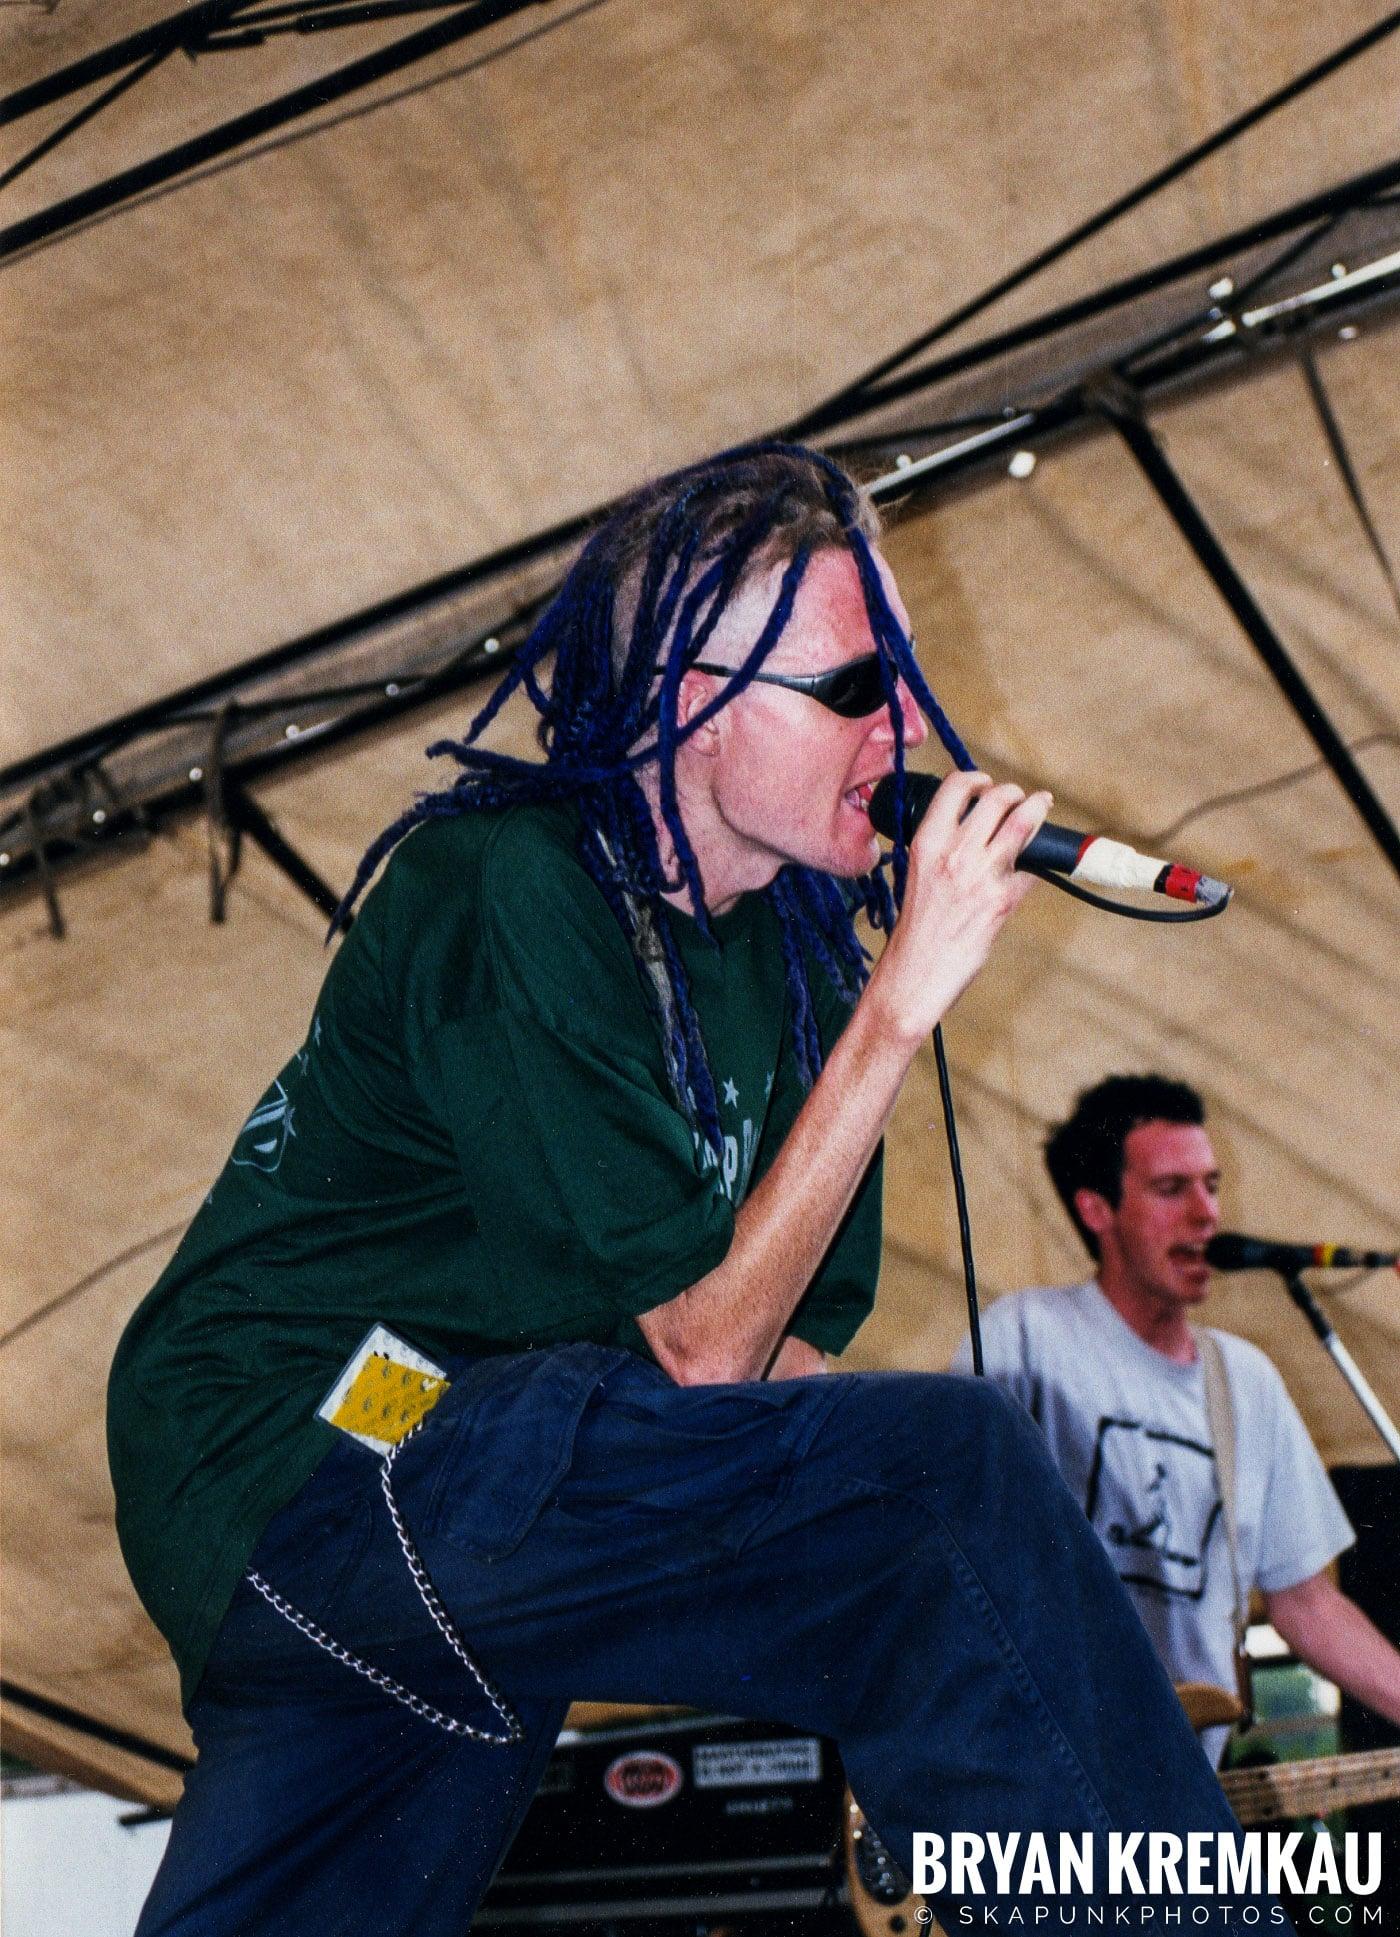 Frenzal Rhomb @ Vans Warped Tour, Randall's Island, NYC - 7.16.99 (8)